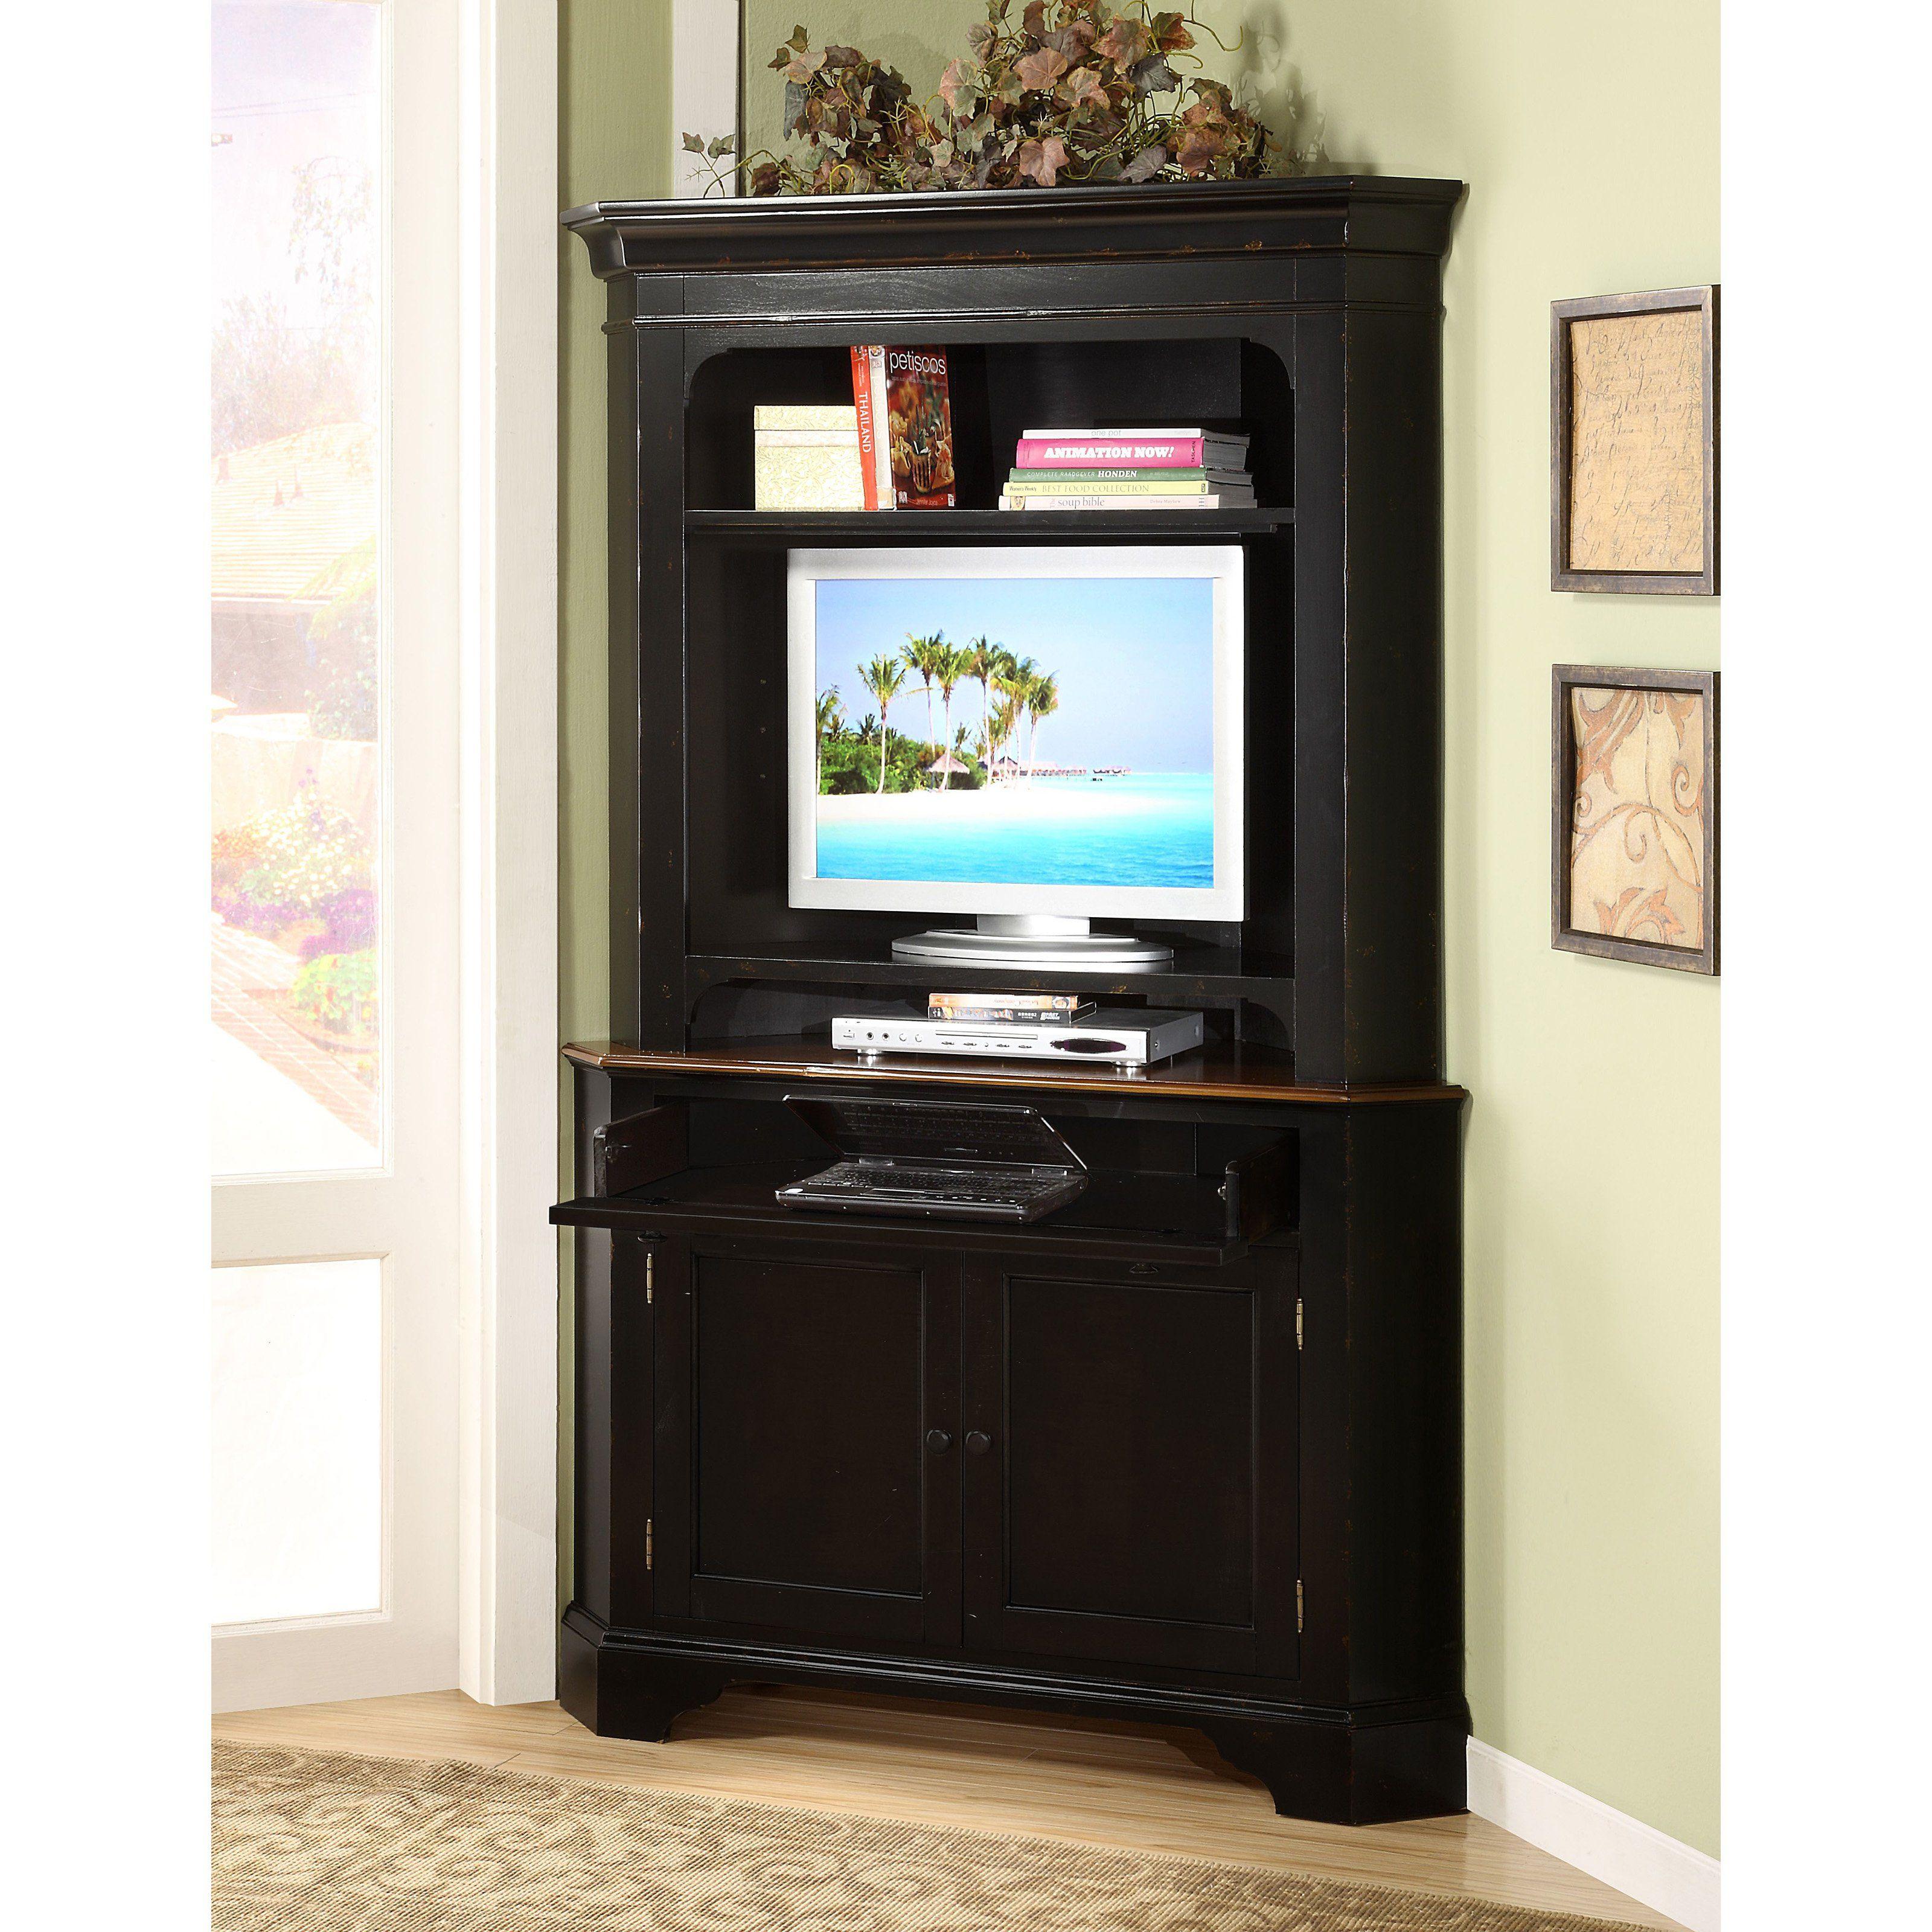 Gentil Computer Armoire For Inspiring Office Furniture Design Ideas: Black Corner  Computer Armoire On Kahrs Flooring